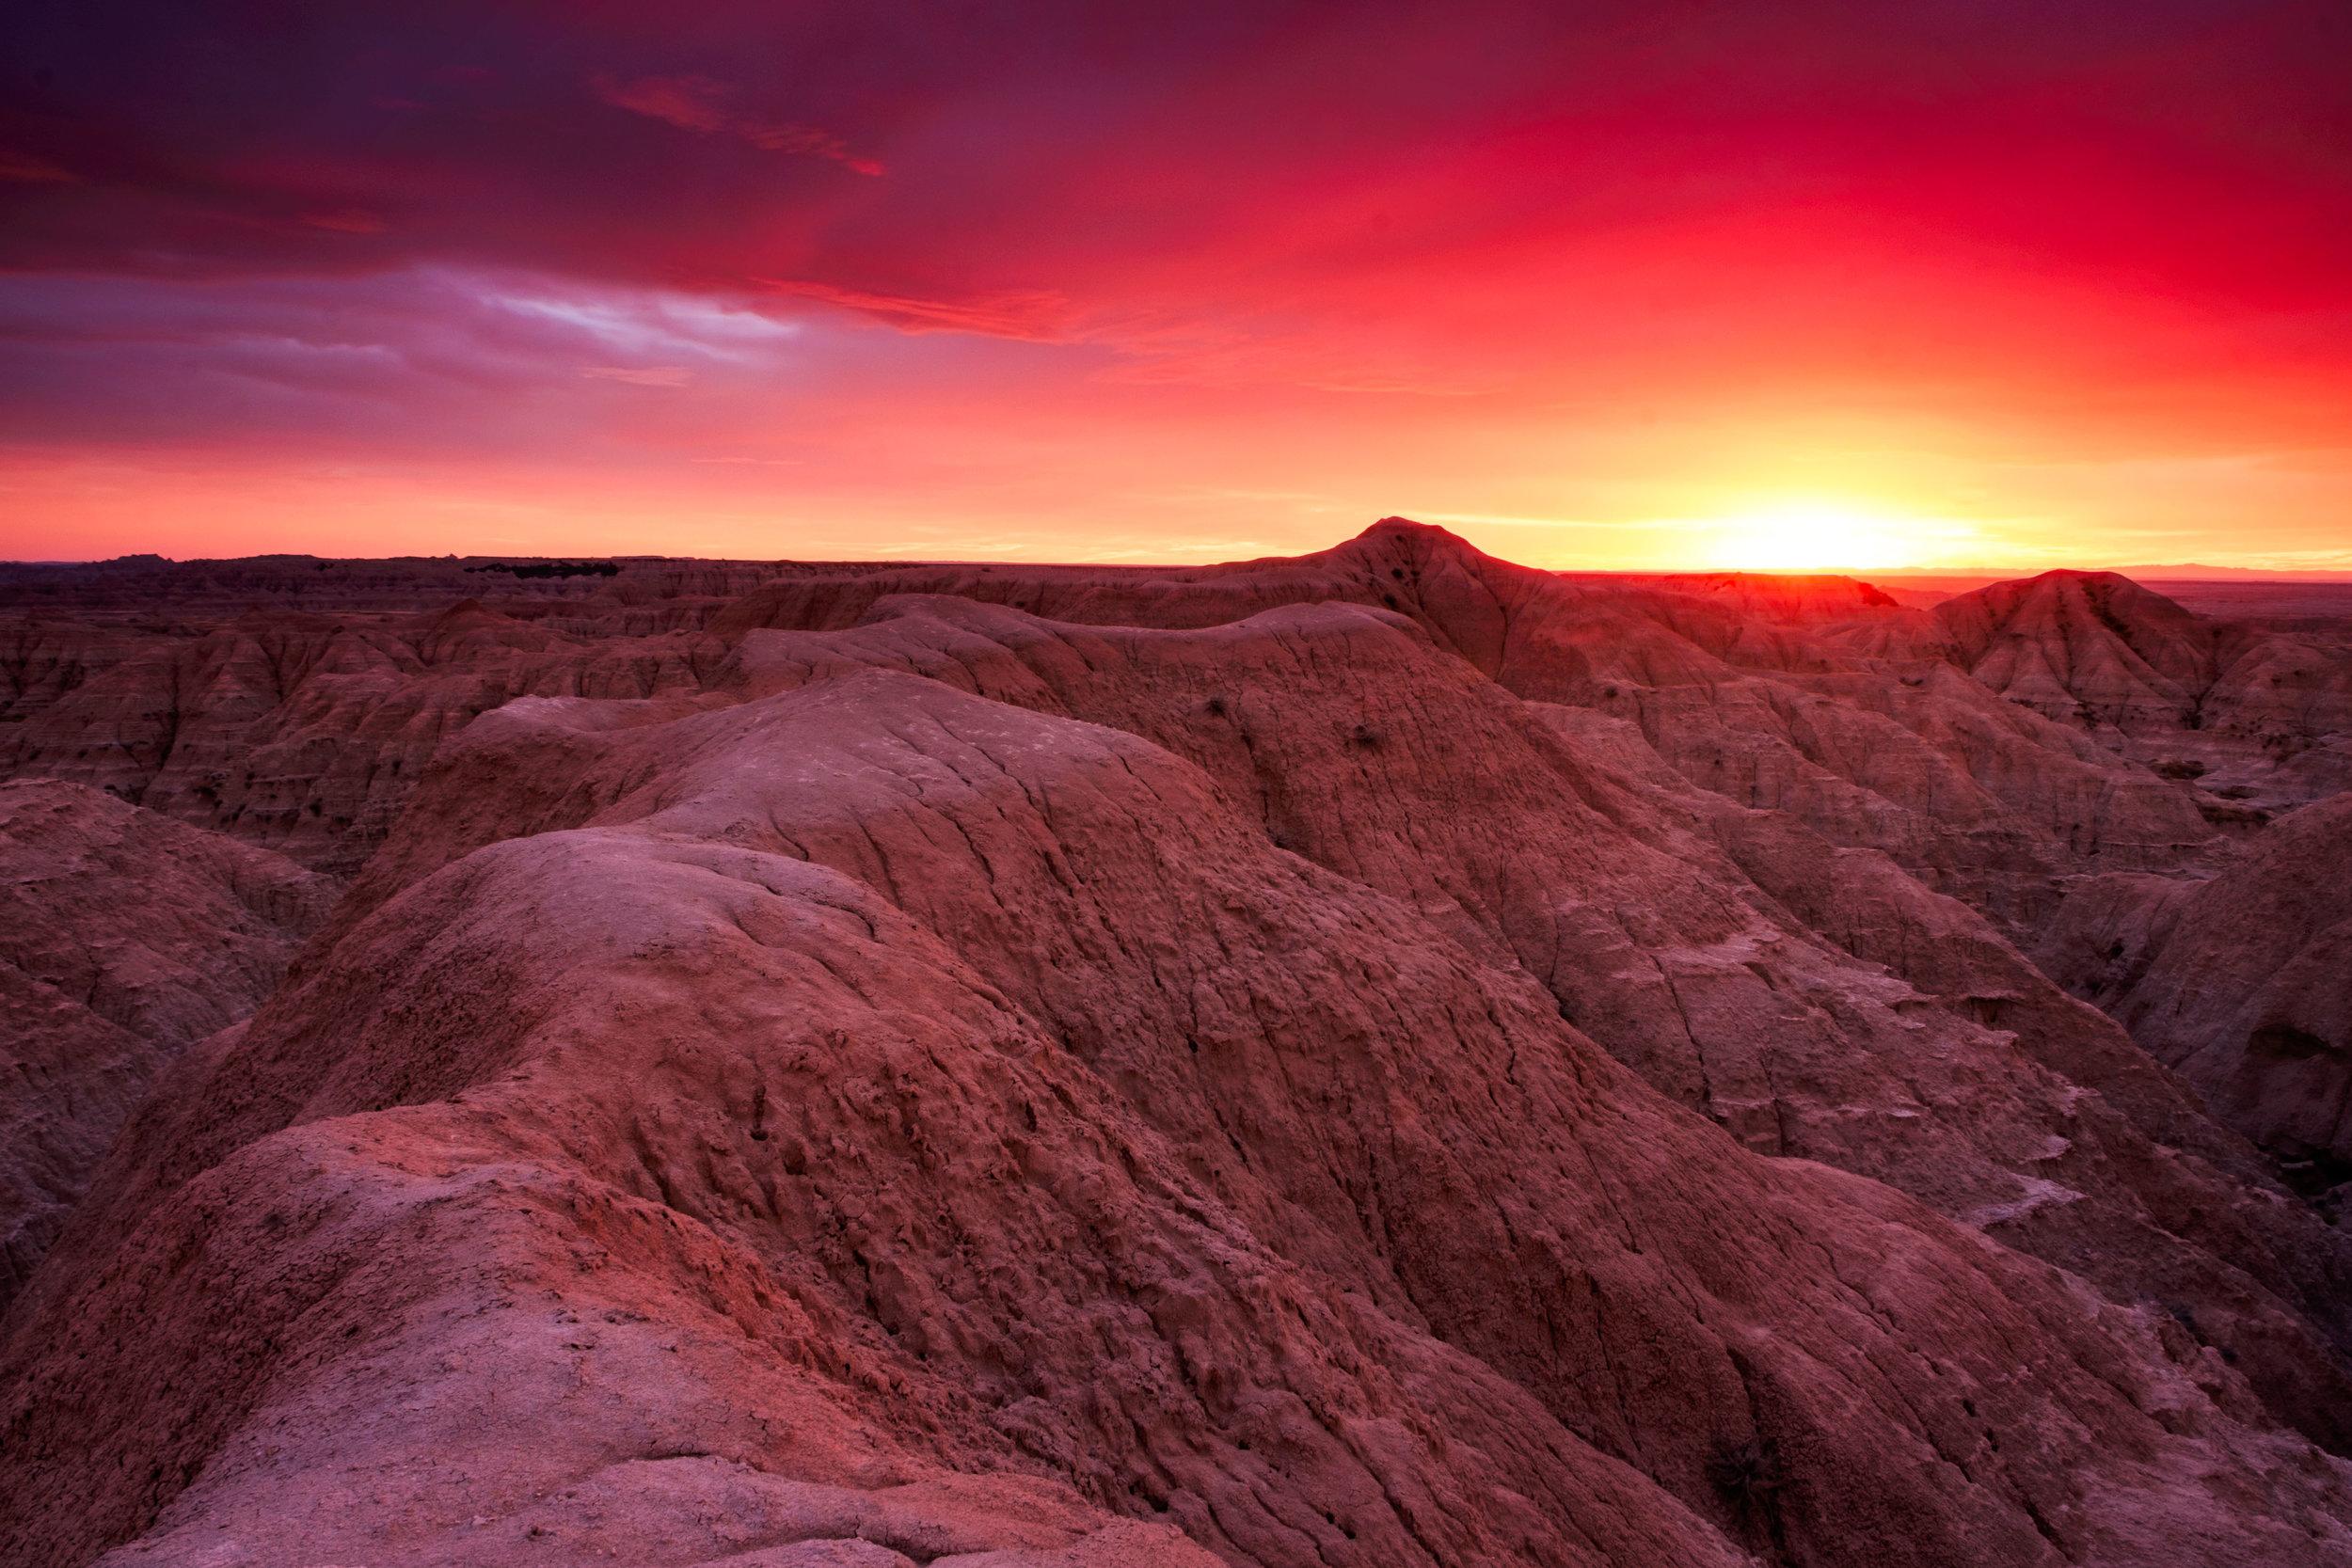 Sunset in Badlands National Park in South Dakota.